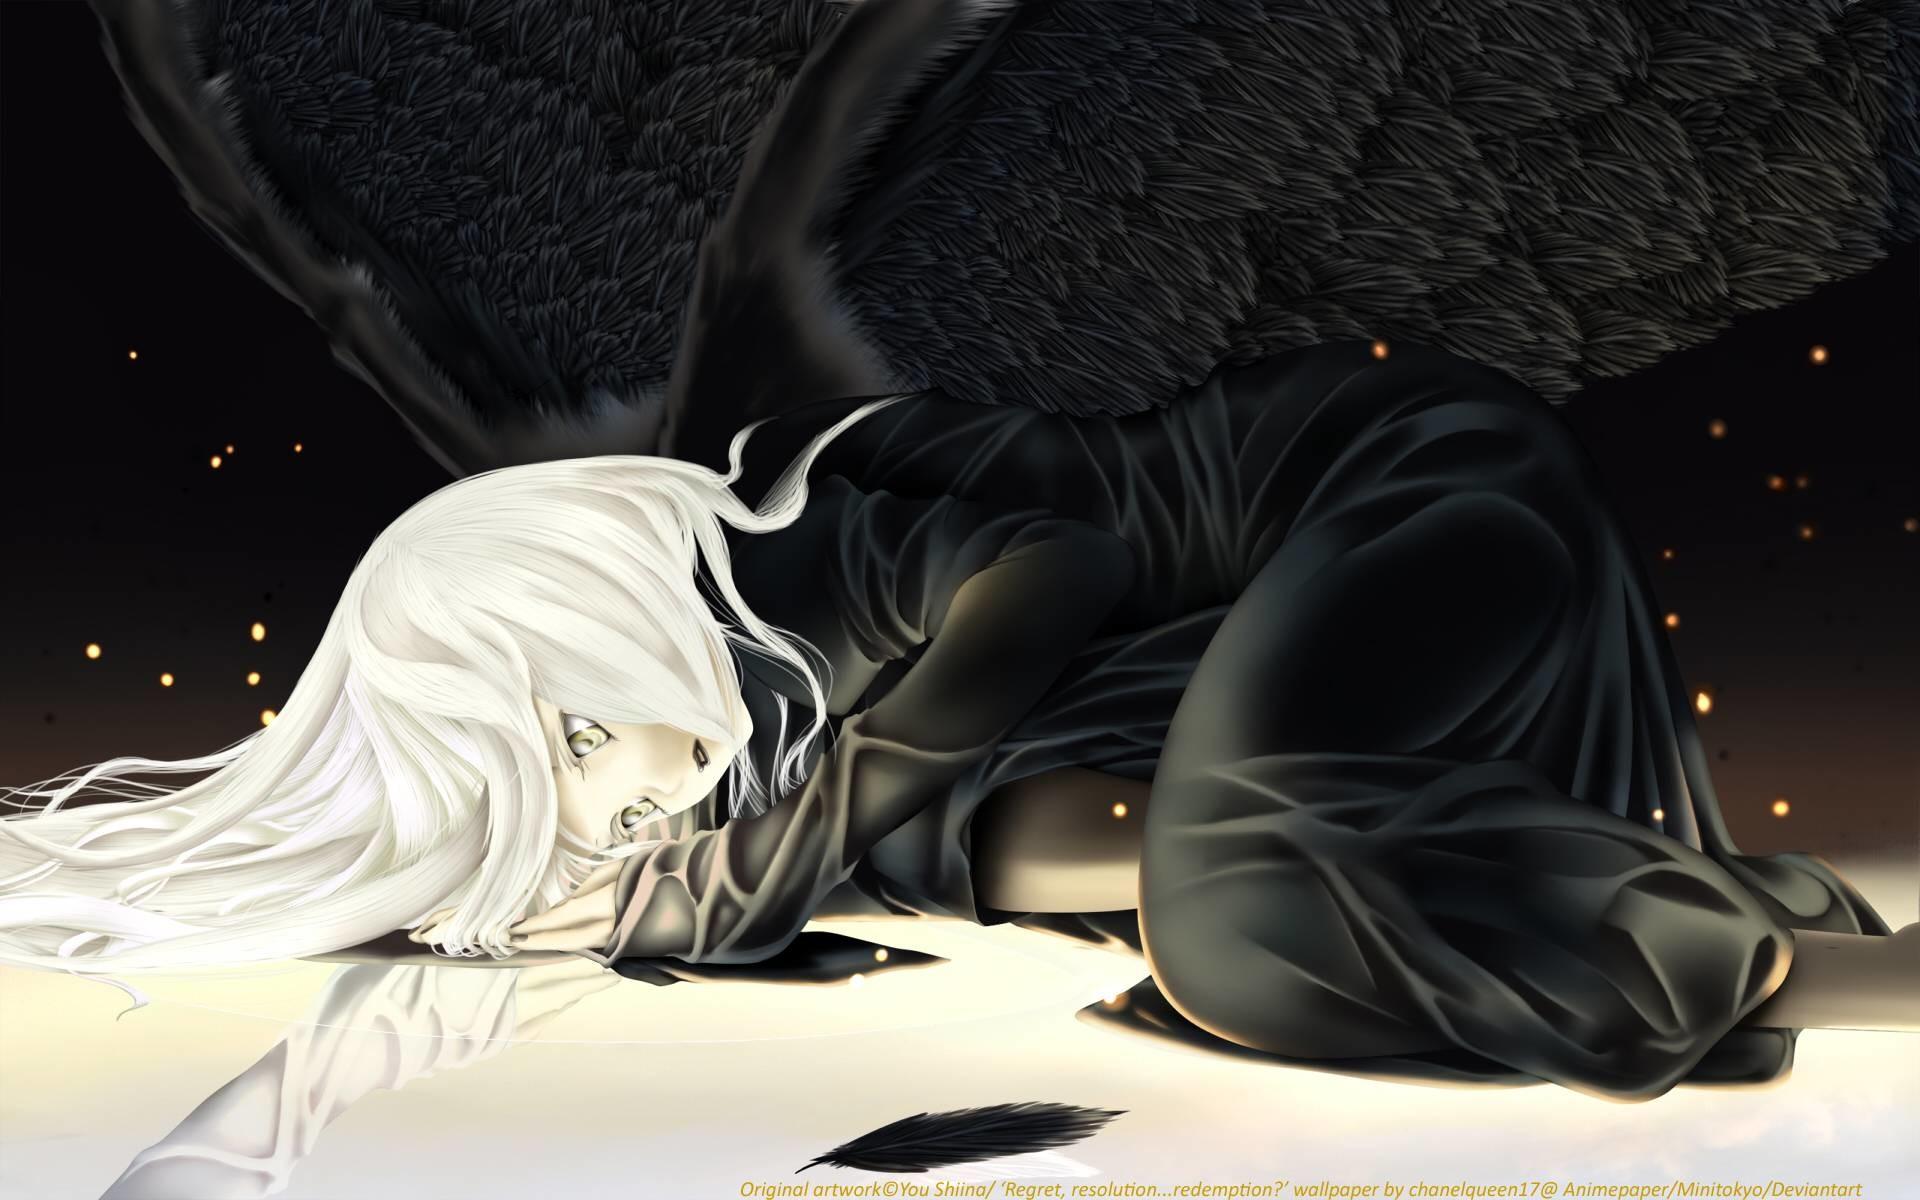 anime anime manga images wallpapers angel with black wings tweet